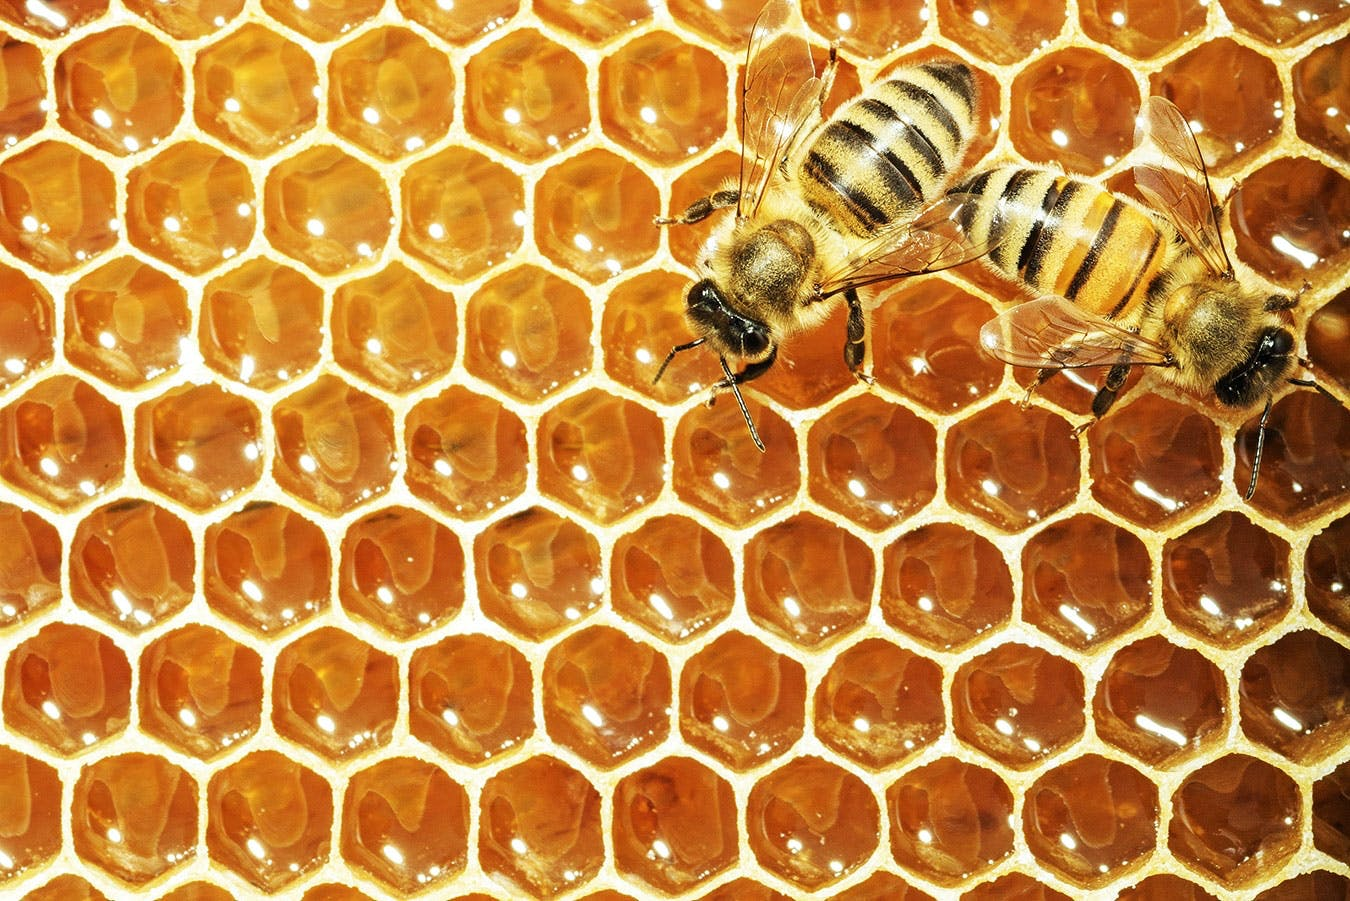 Kan honning holde evigt?